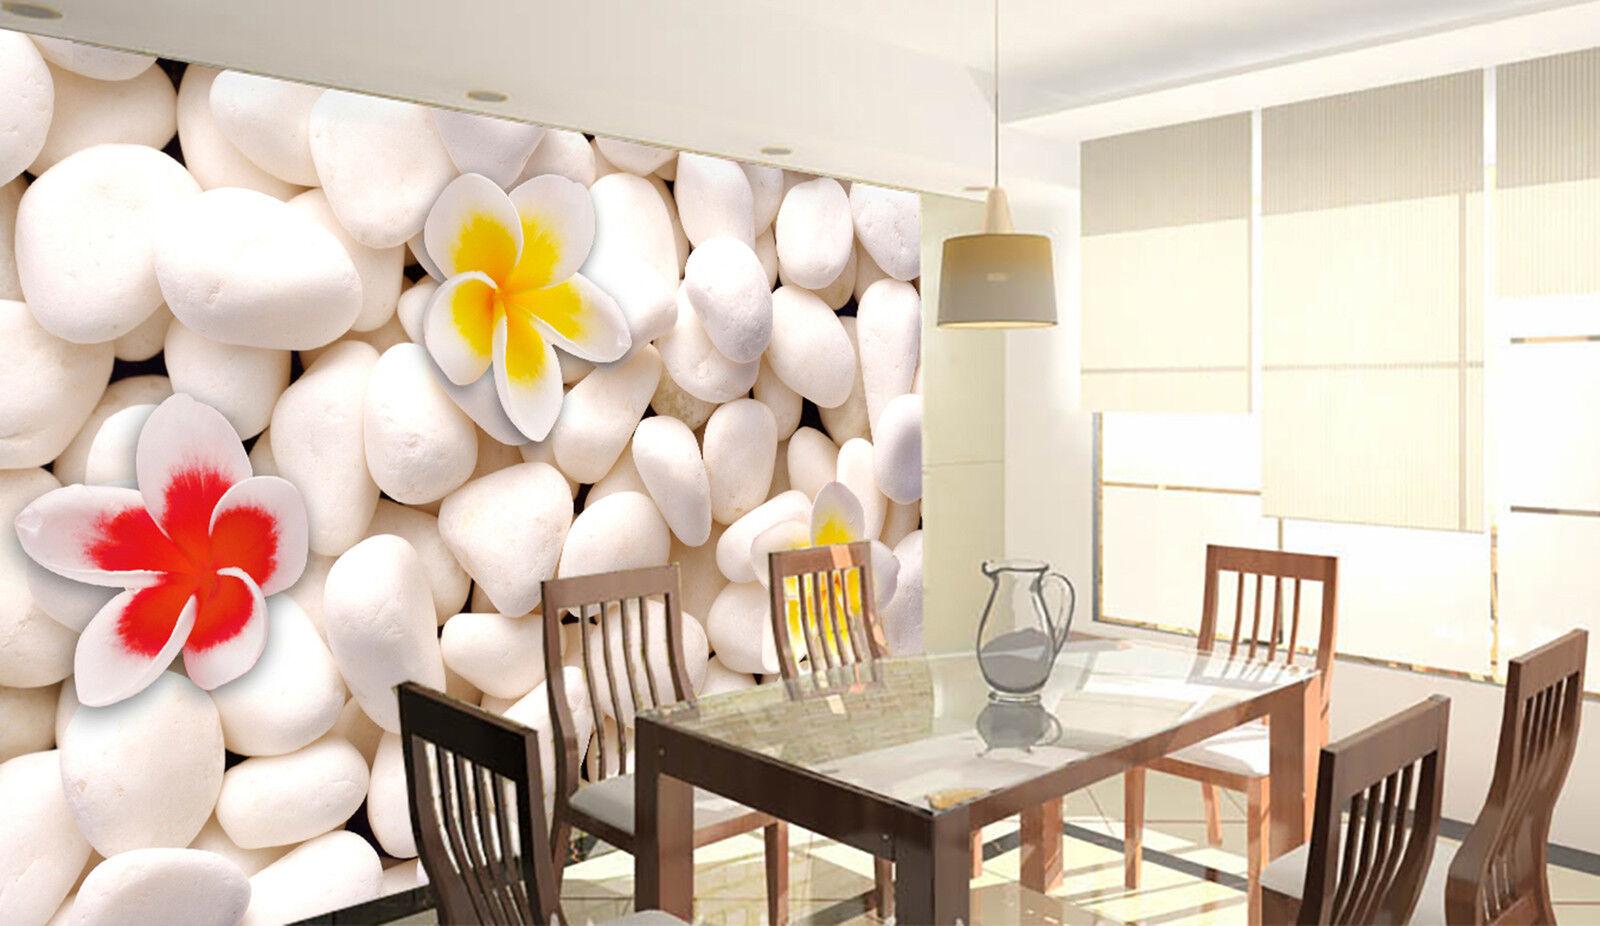 3D Kiesel Blumen Fototapeten Wandbild Fototapete Bild Tapete Familie Kinder